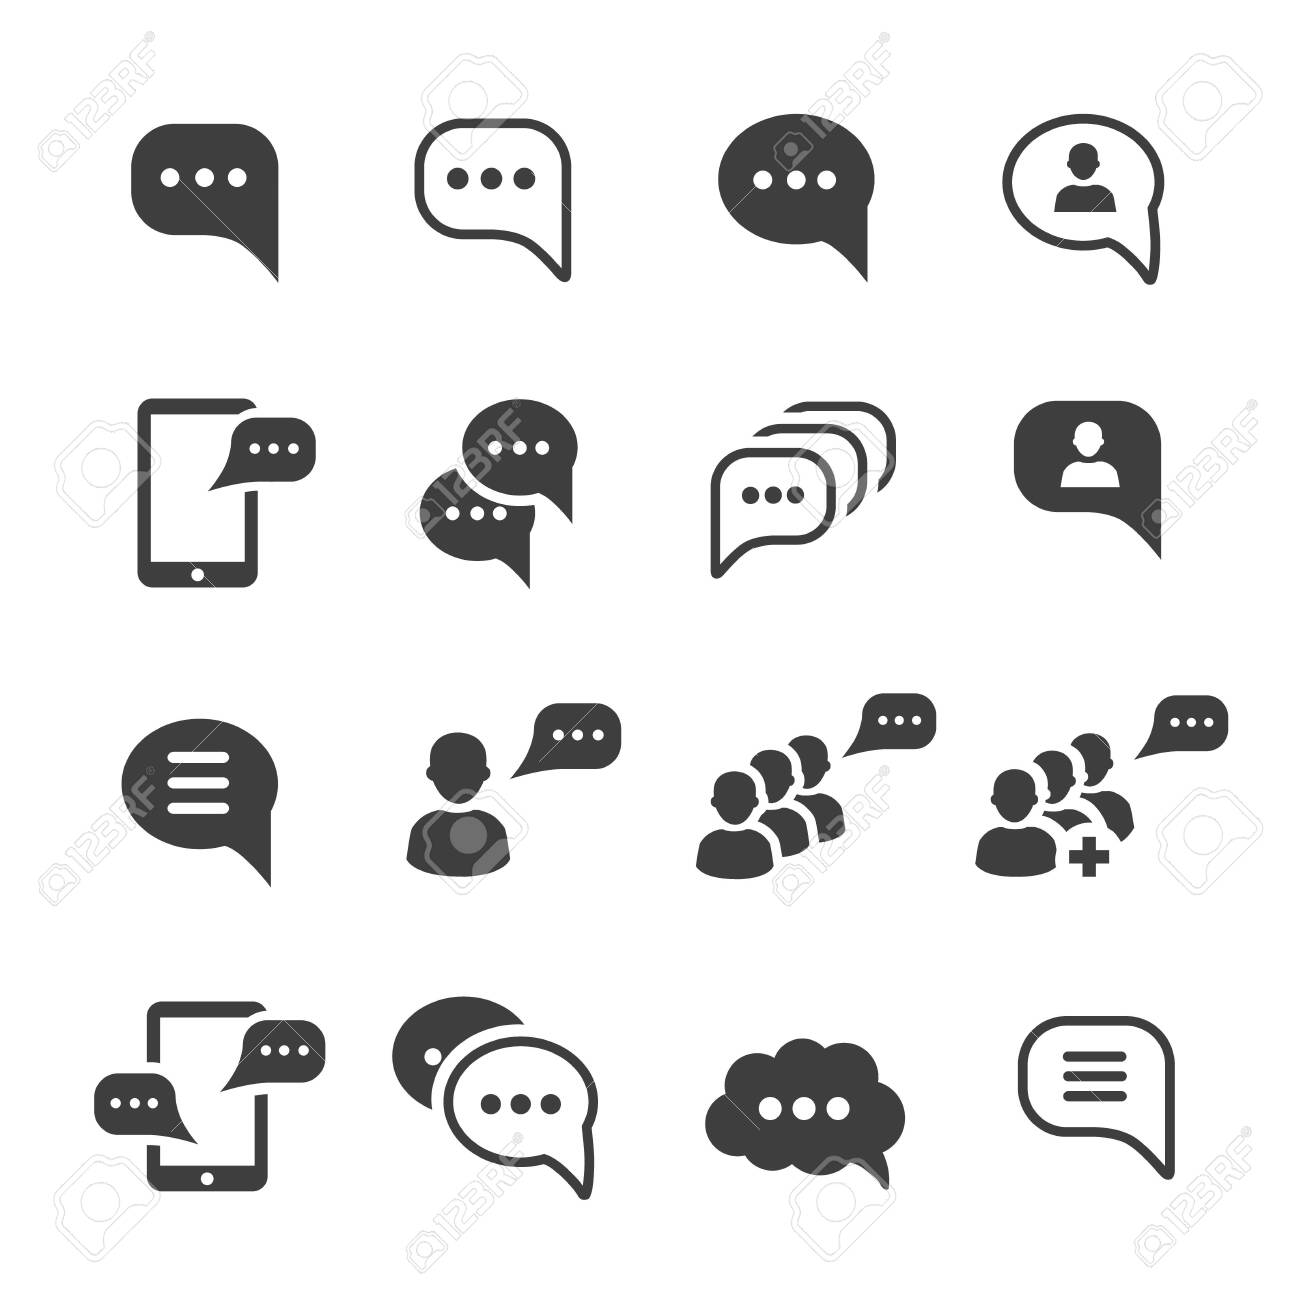 Speech message talk text bubble icons set - 138382249